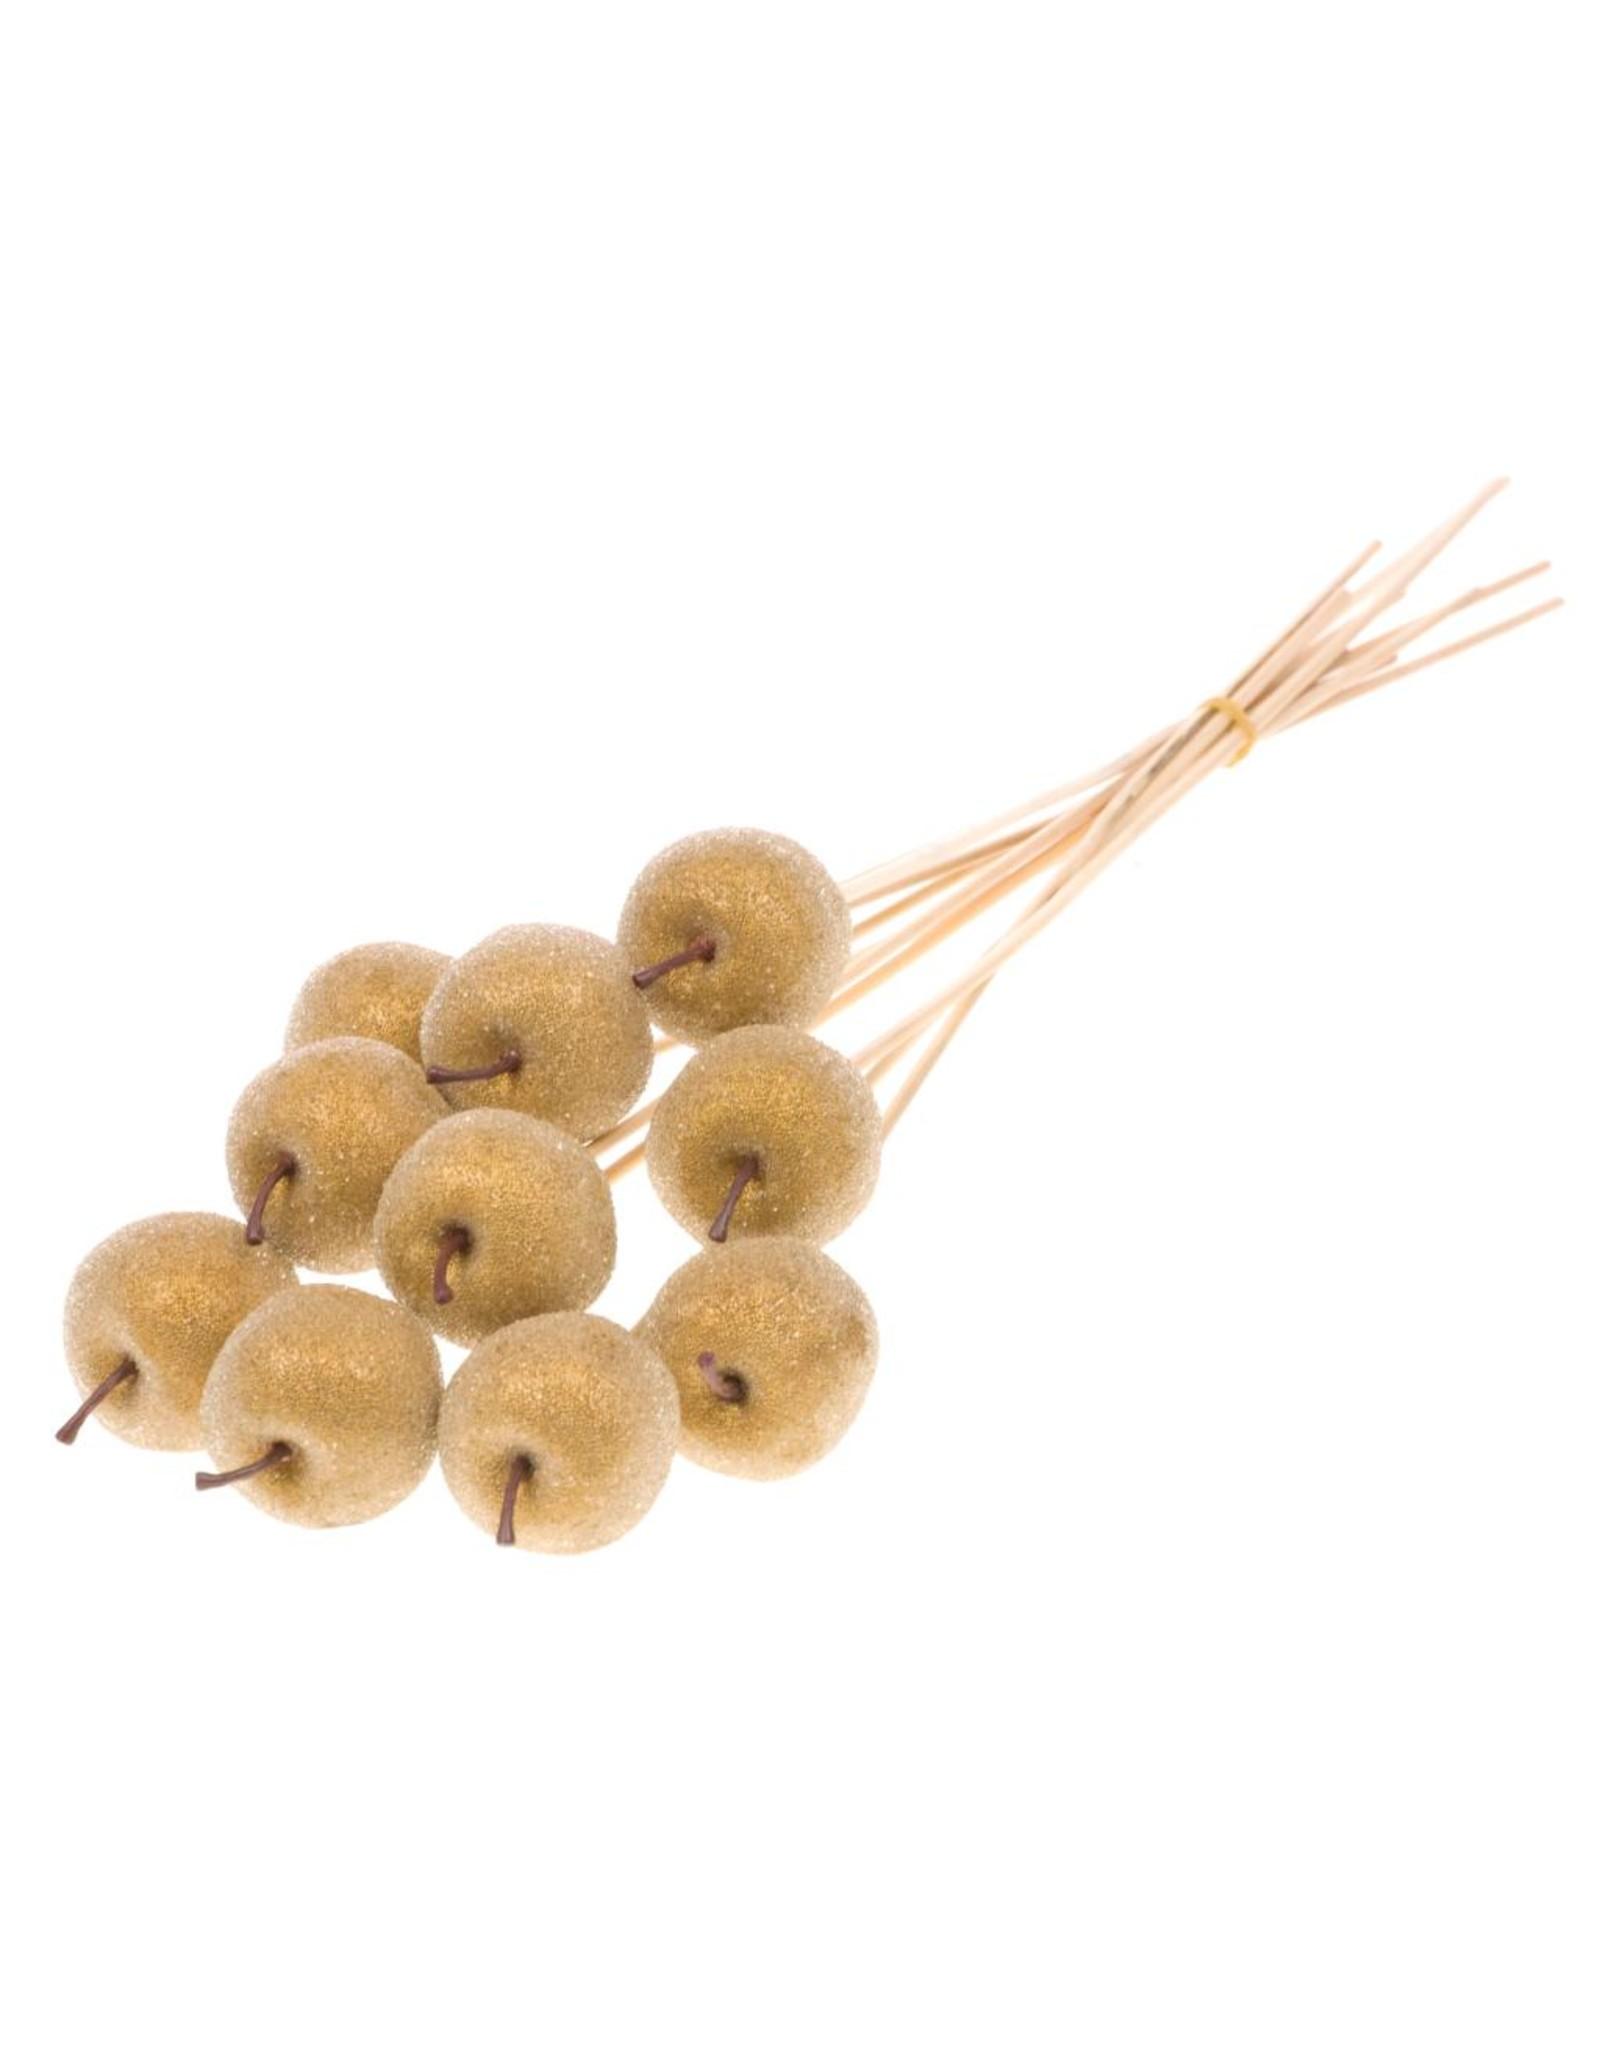 Apple sugar 5cm o/s 10pc SB gold x 4